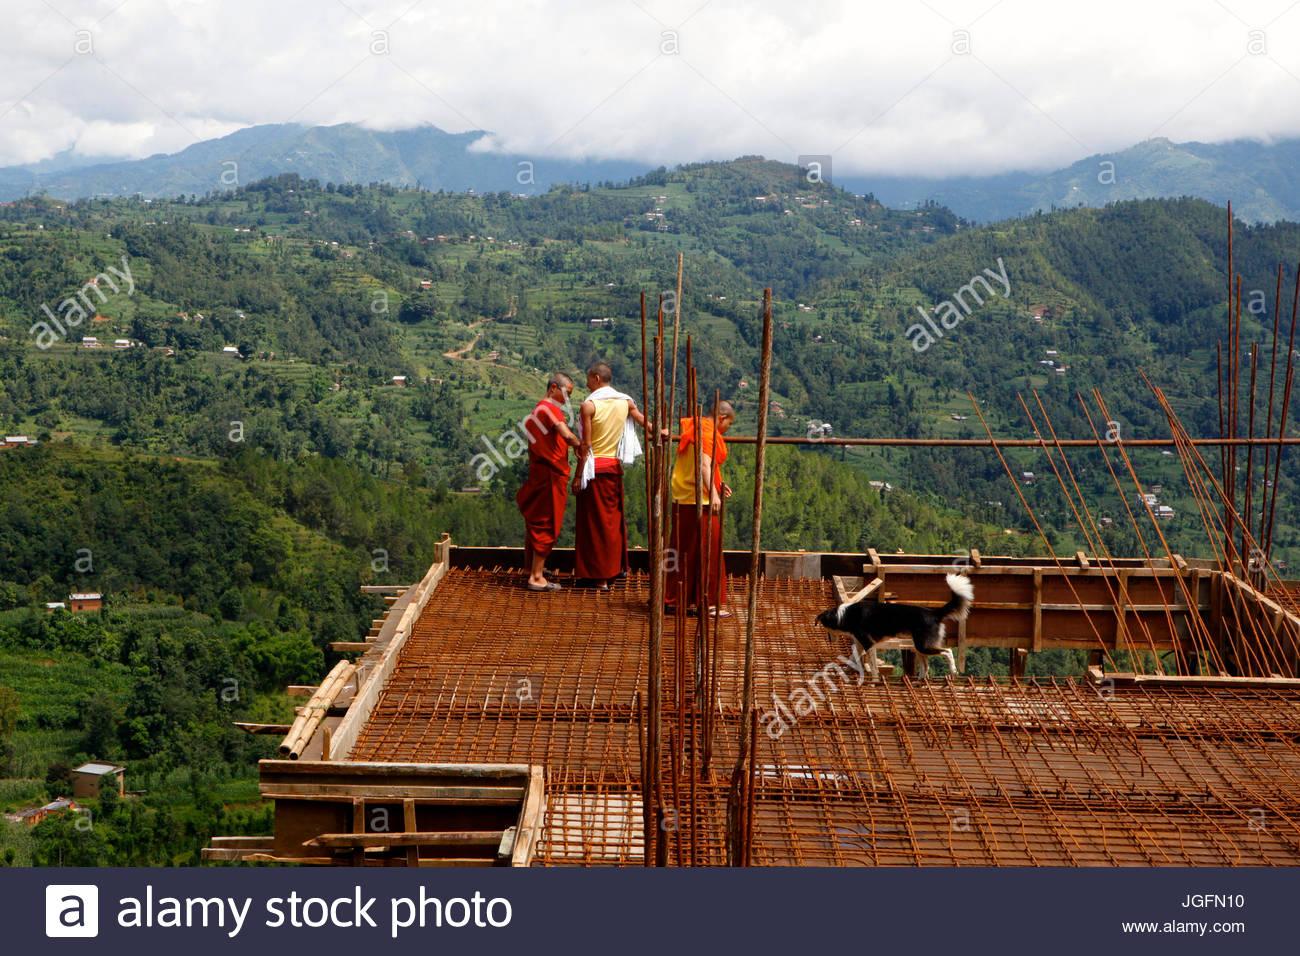 Monks do construction work at Namo Buddha monastery. - Stock Image